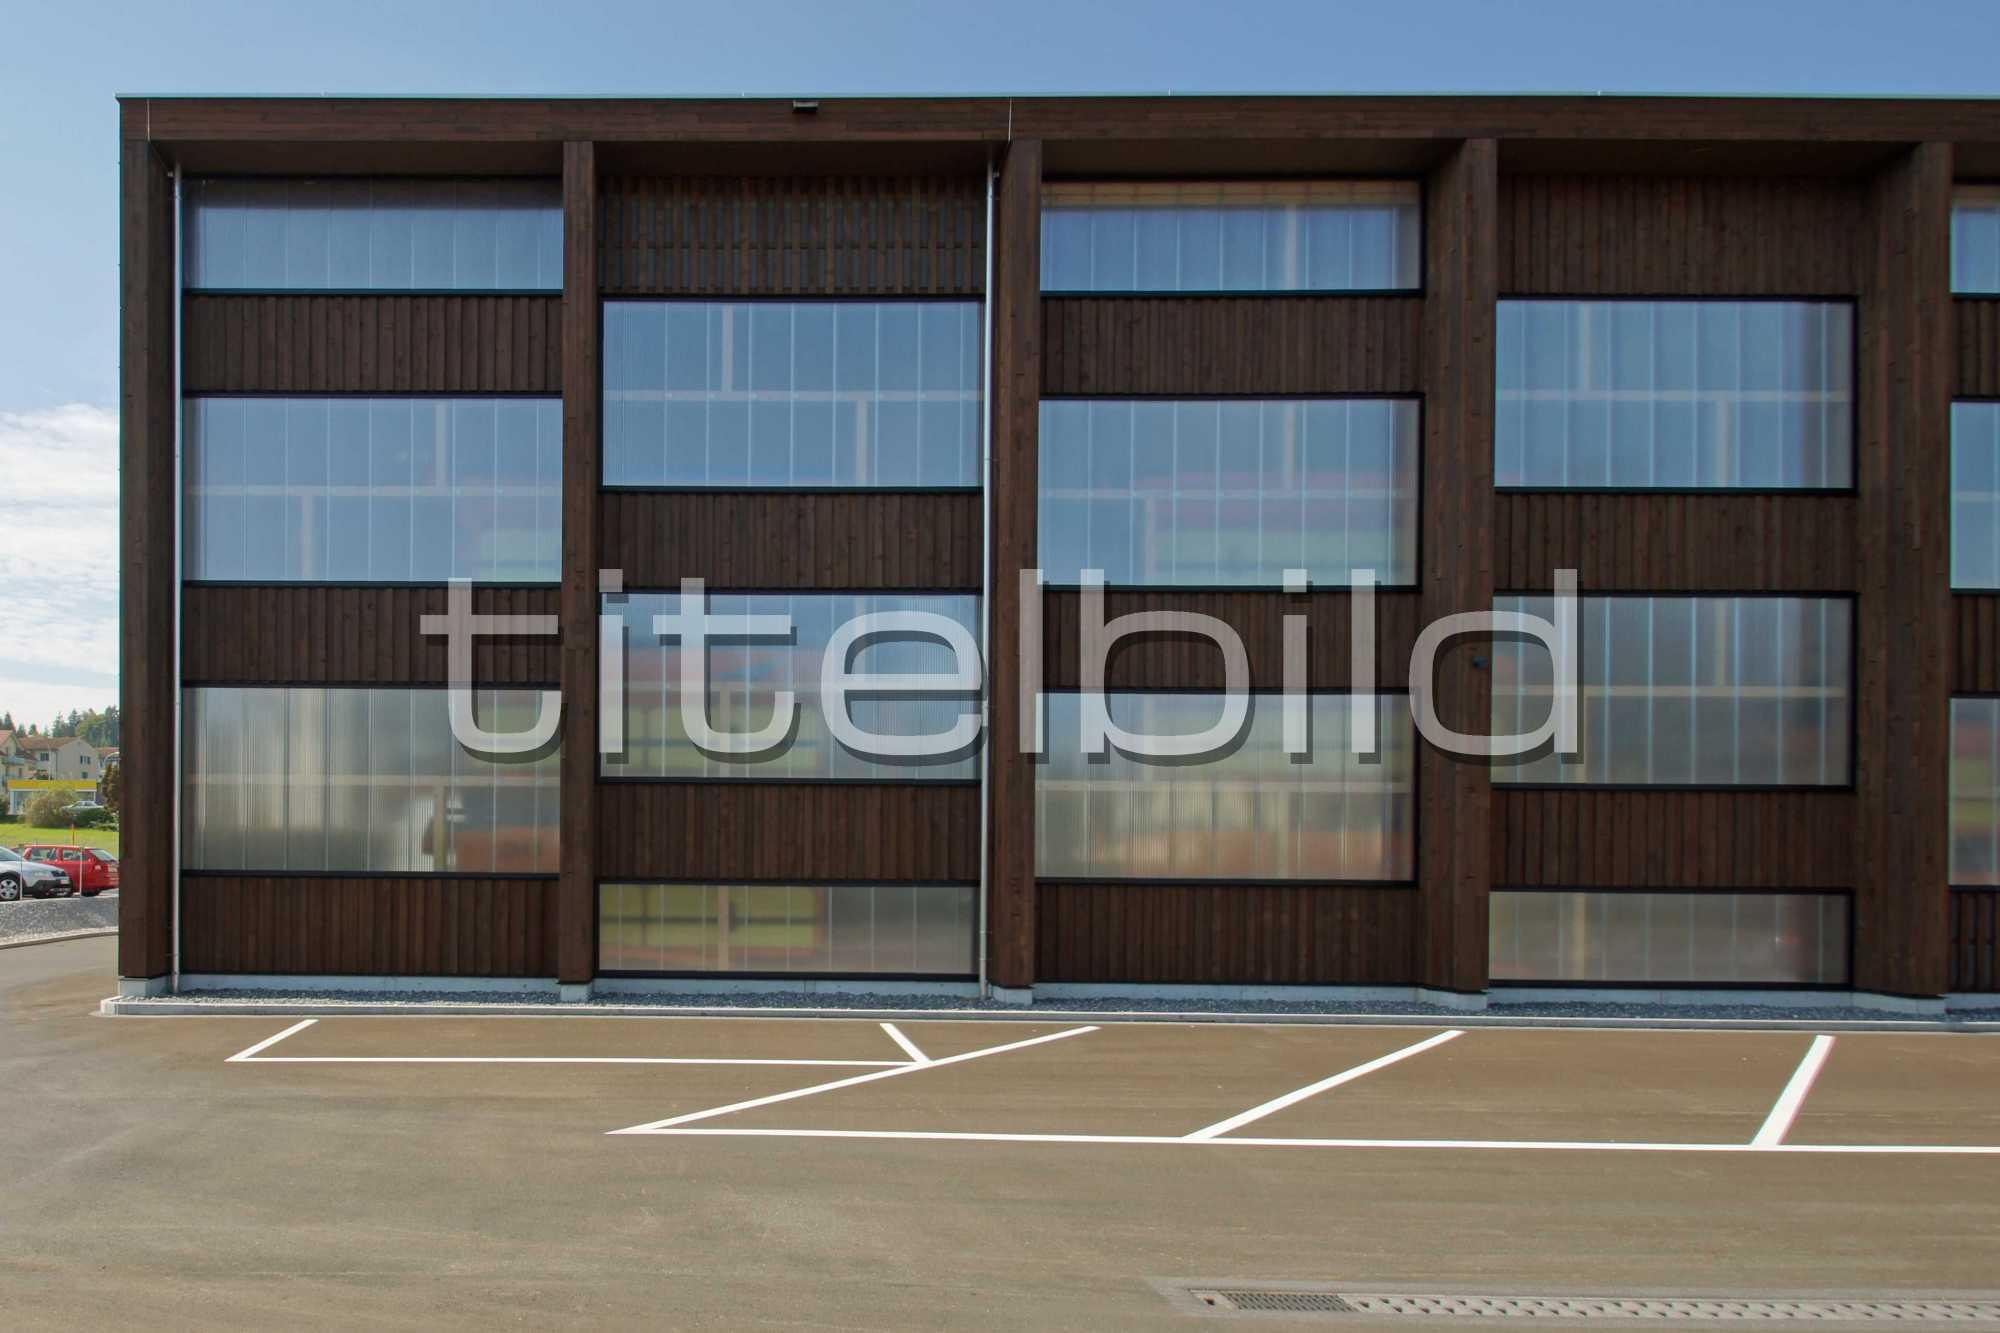 Projektbild-Nr. 2: Autobahn Werkhof Sprengi